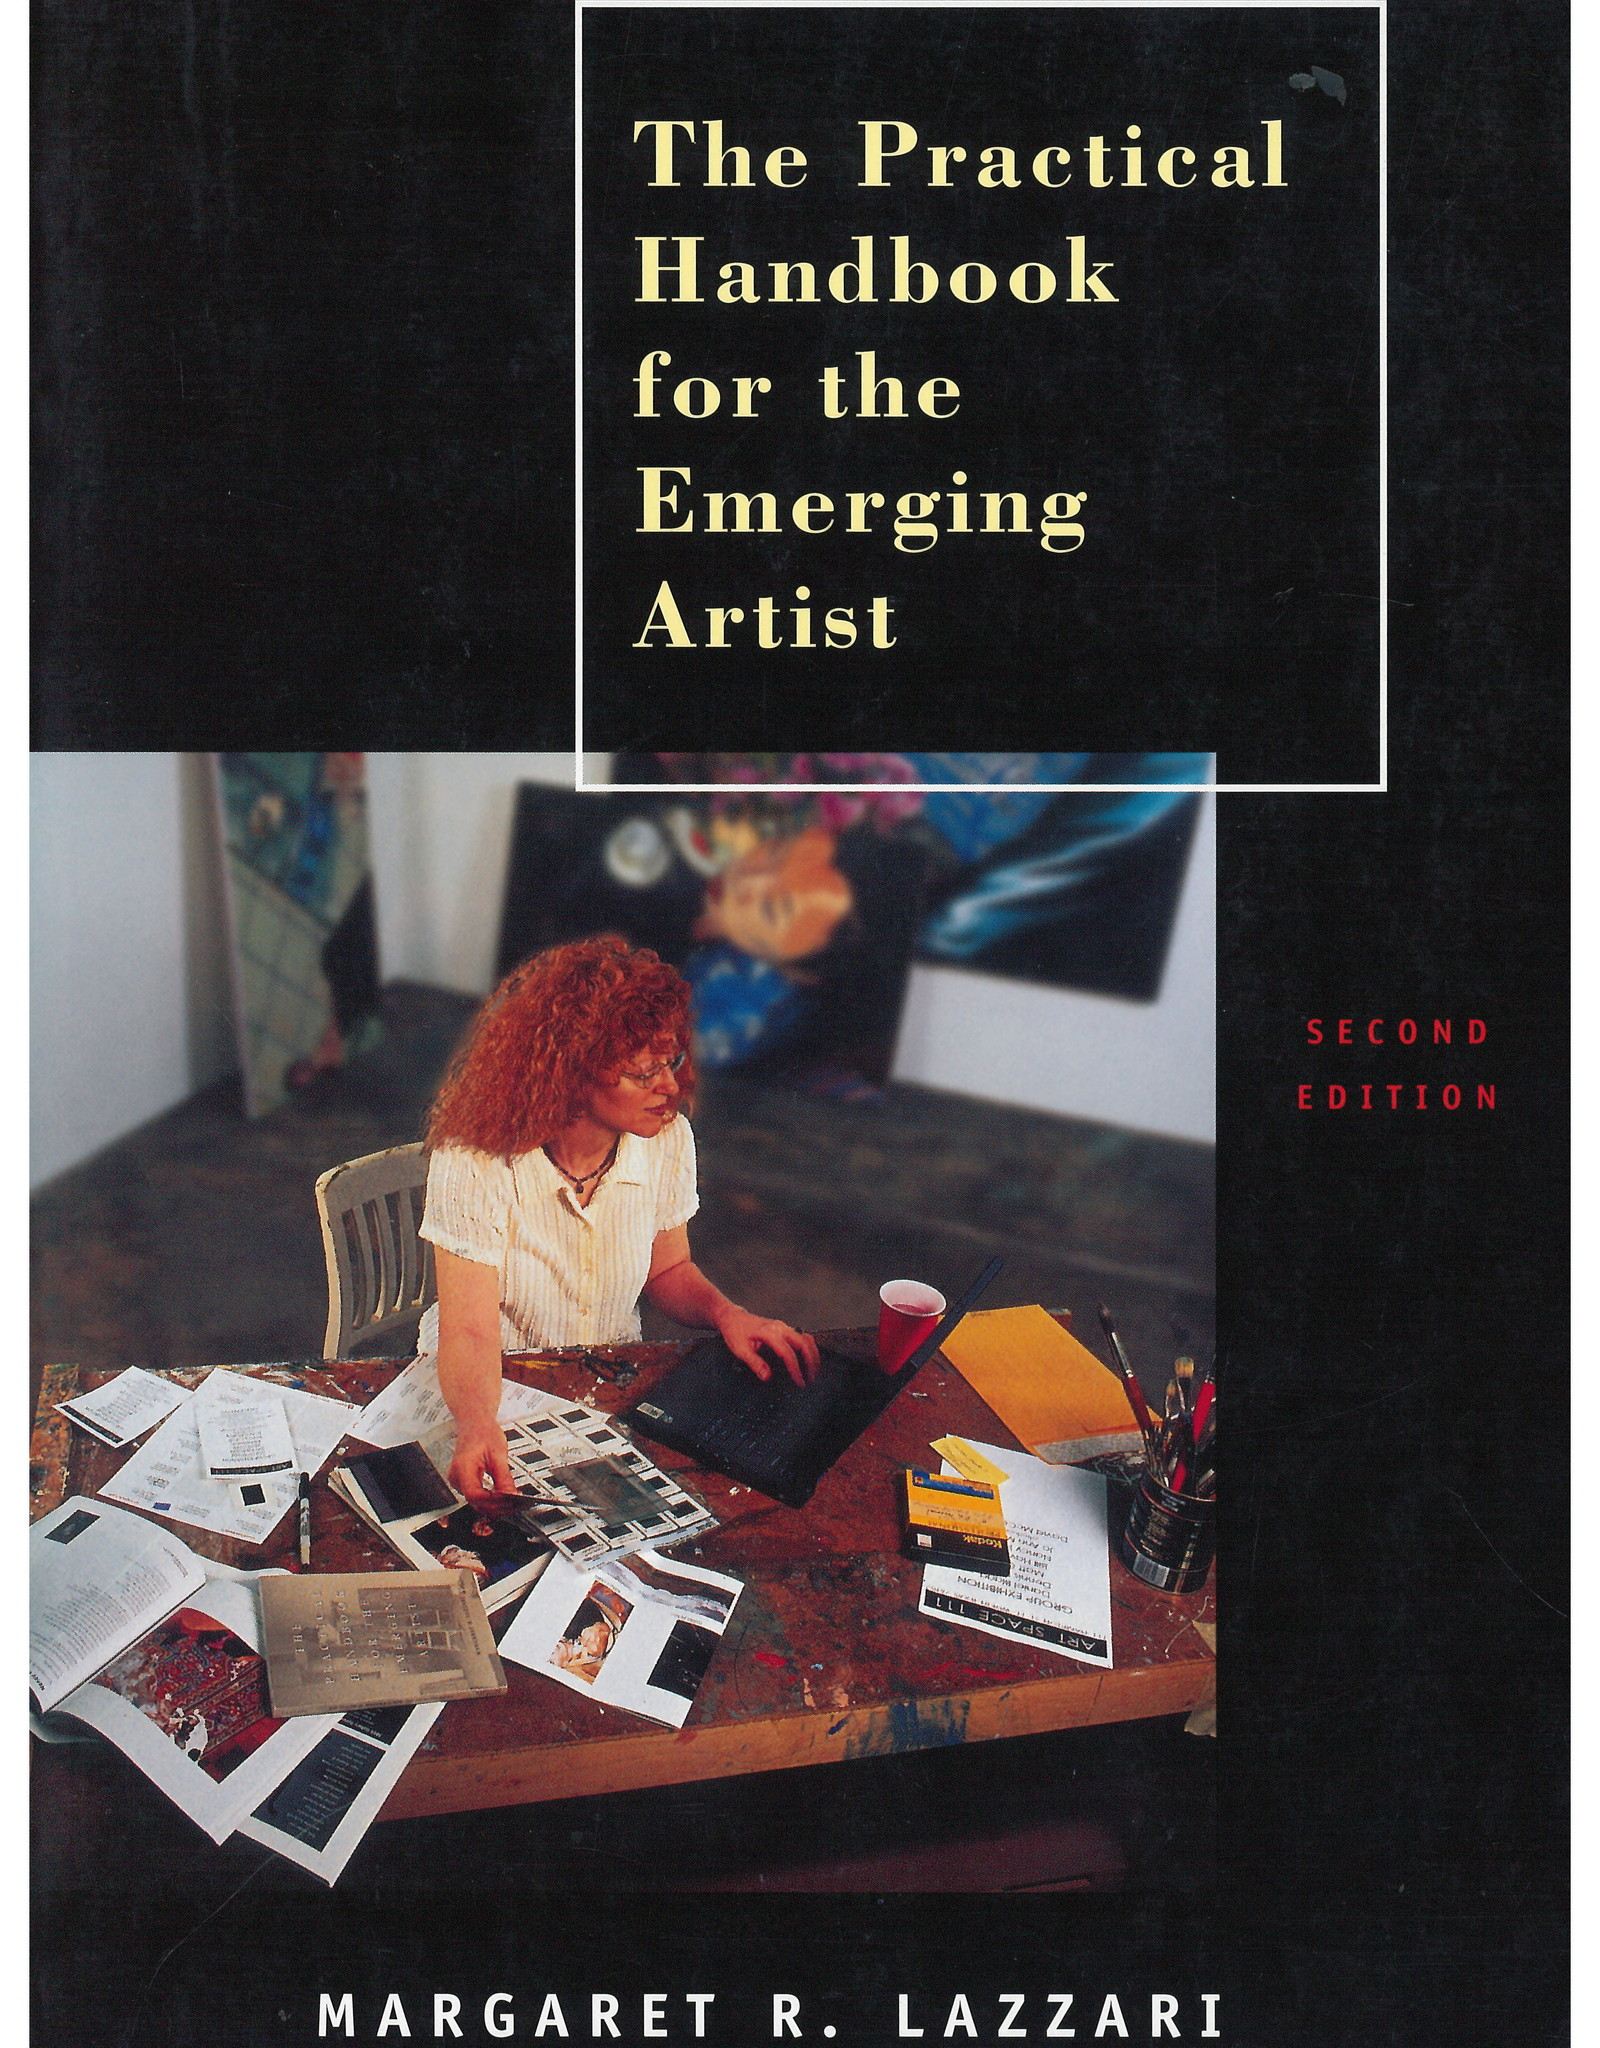 The Practical Handbook Emerging Artist / Margaret R. Lazzari